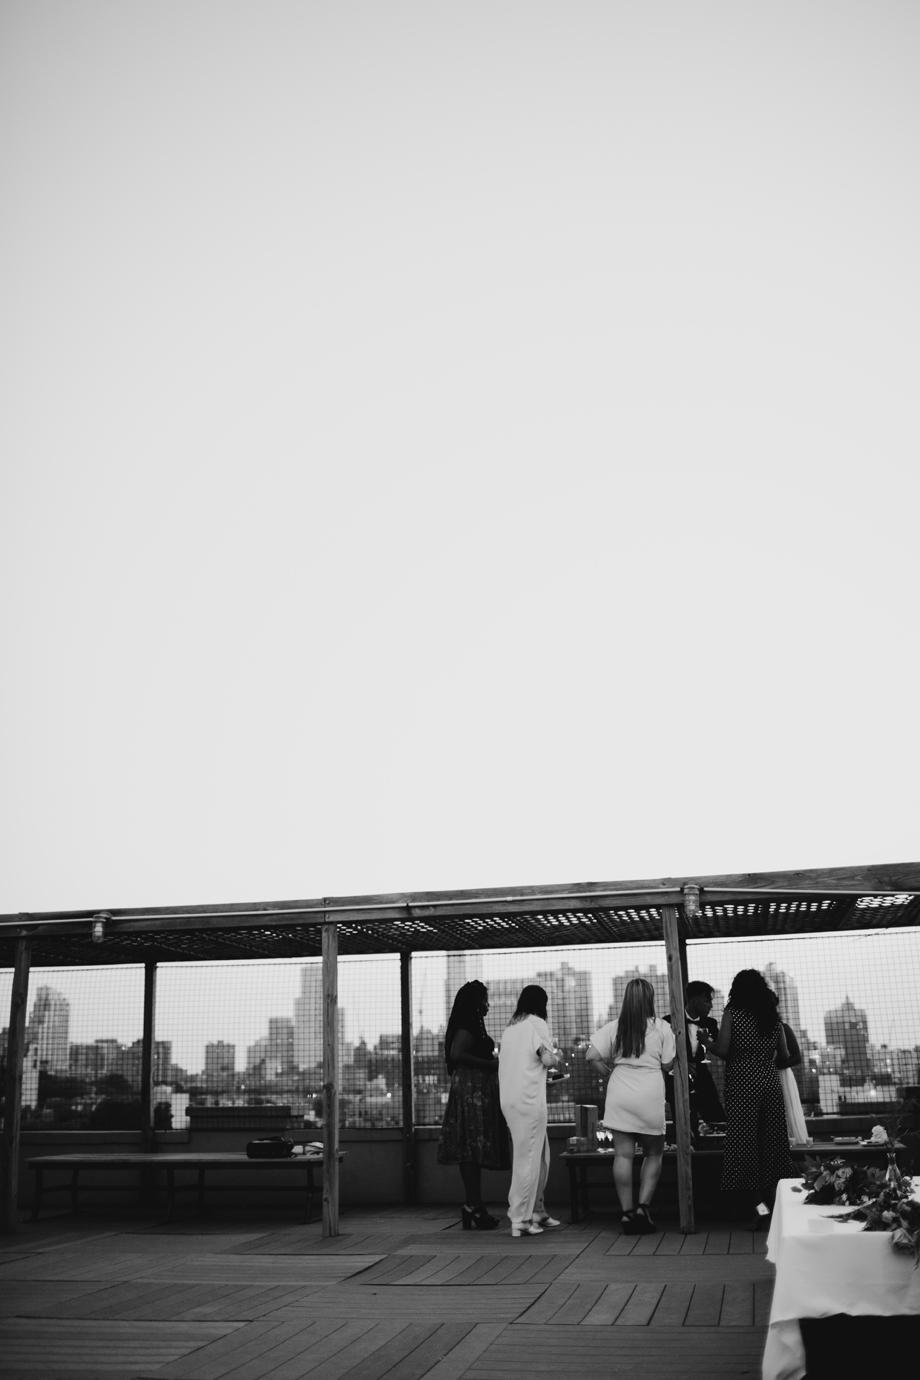 176-new-york-destination-photographer-brooklyn.jpg